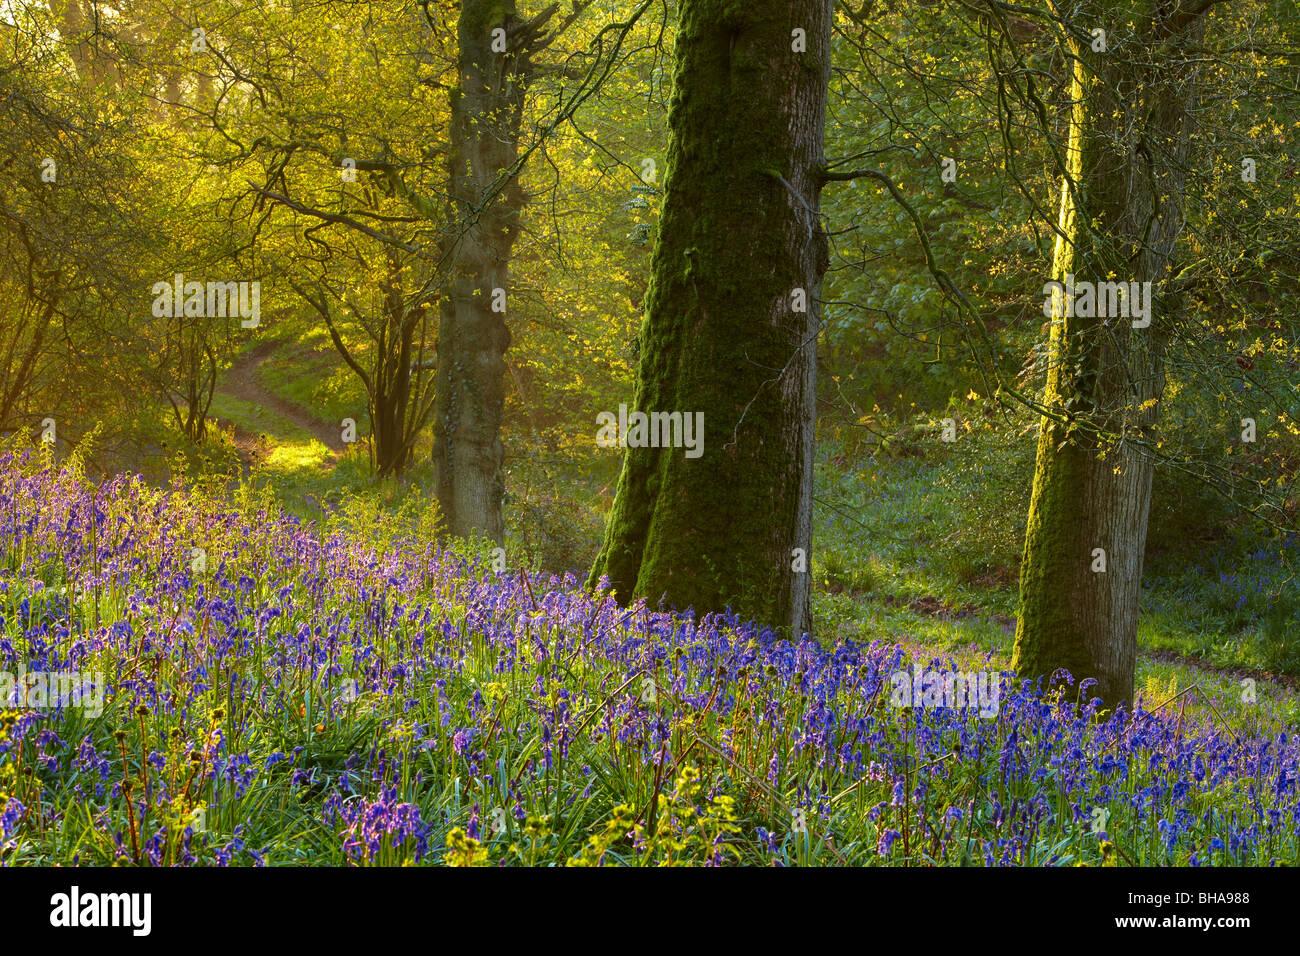 erste Licht im Bluebell Wald bei Batcombe, Dorset, England, UK Stockbild